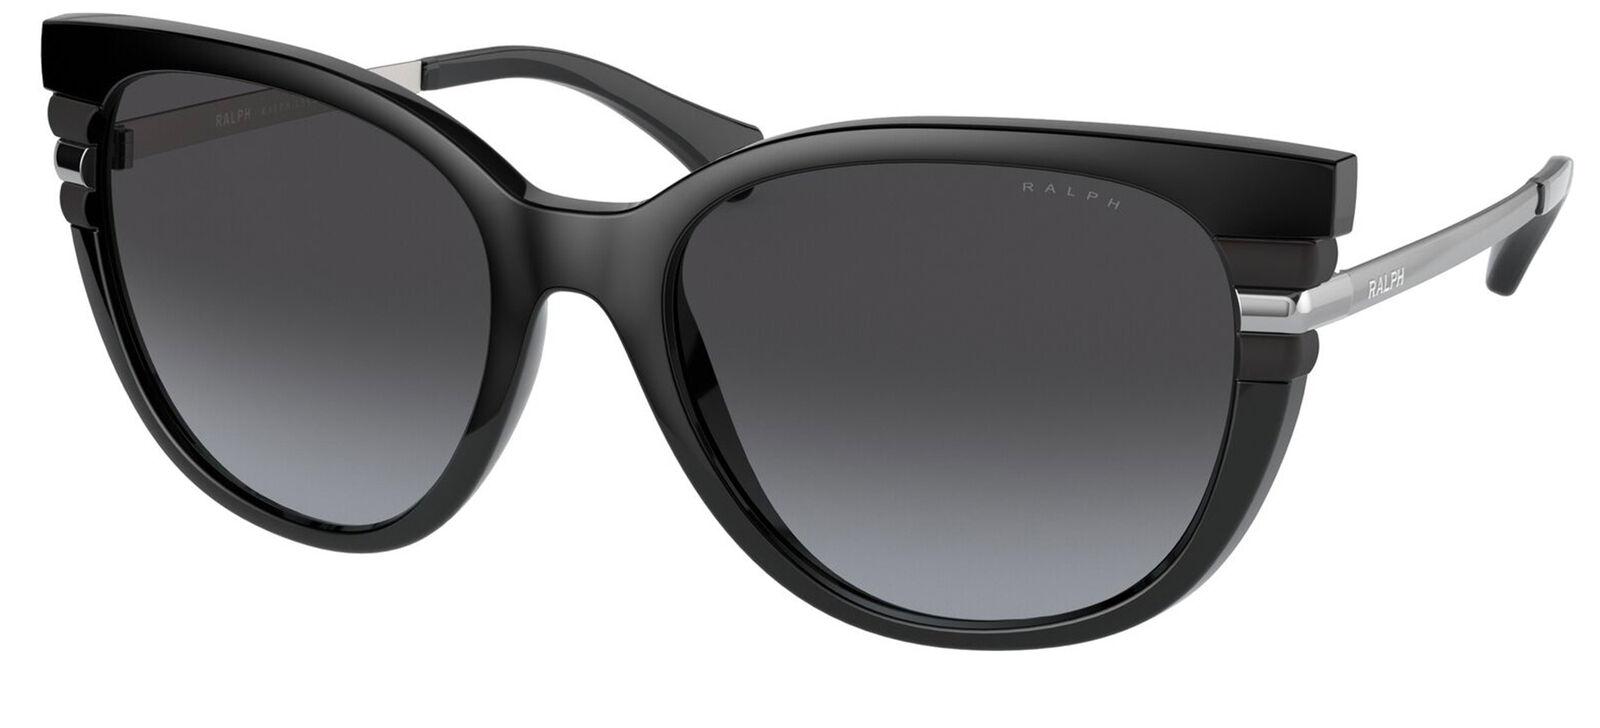 Ralph RA 5276 Black/Grey Shaded 56/18/140 women Sunglasses